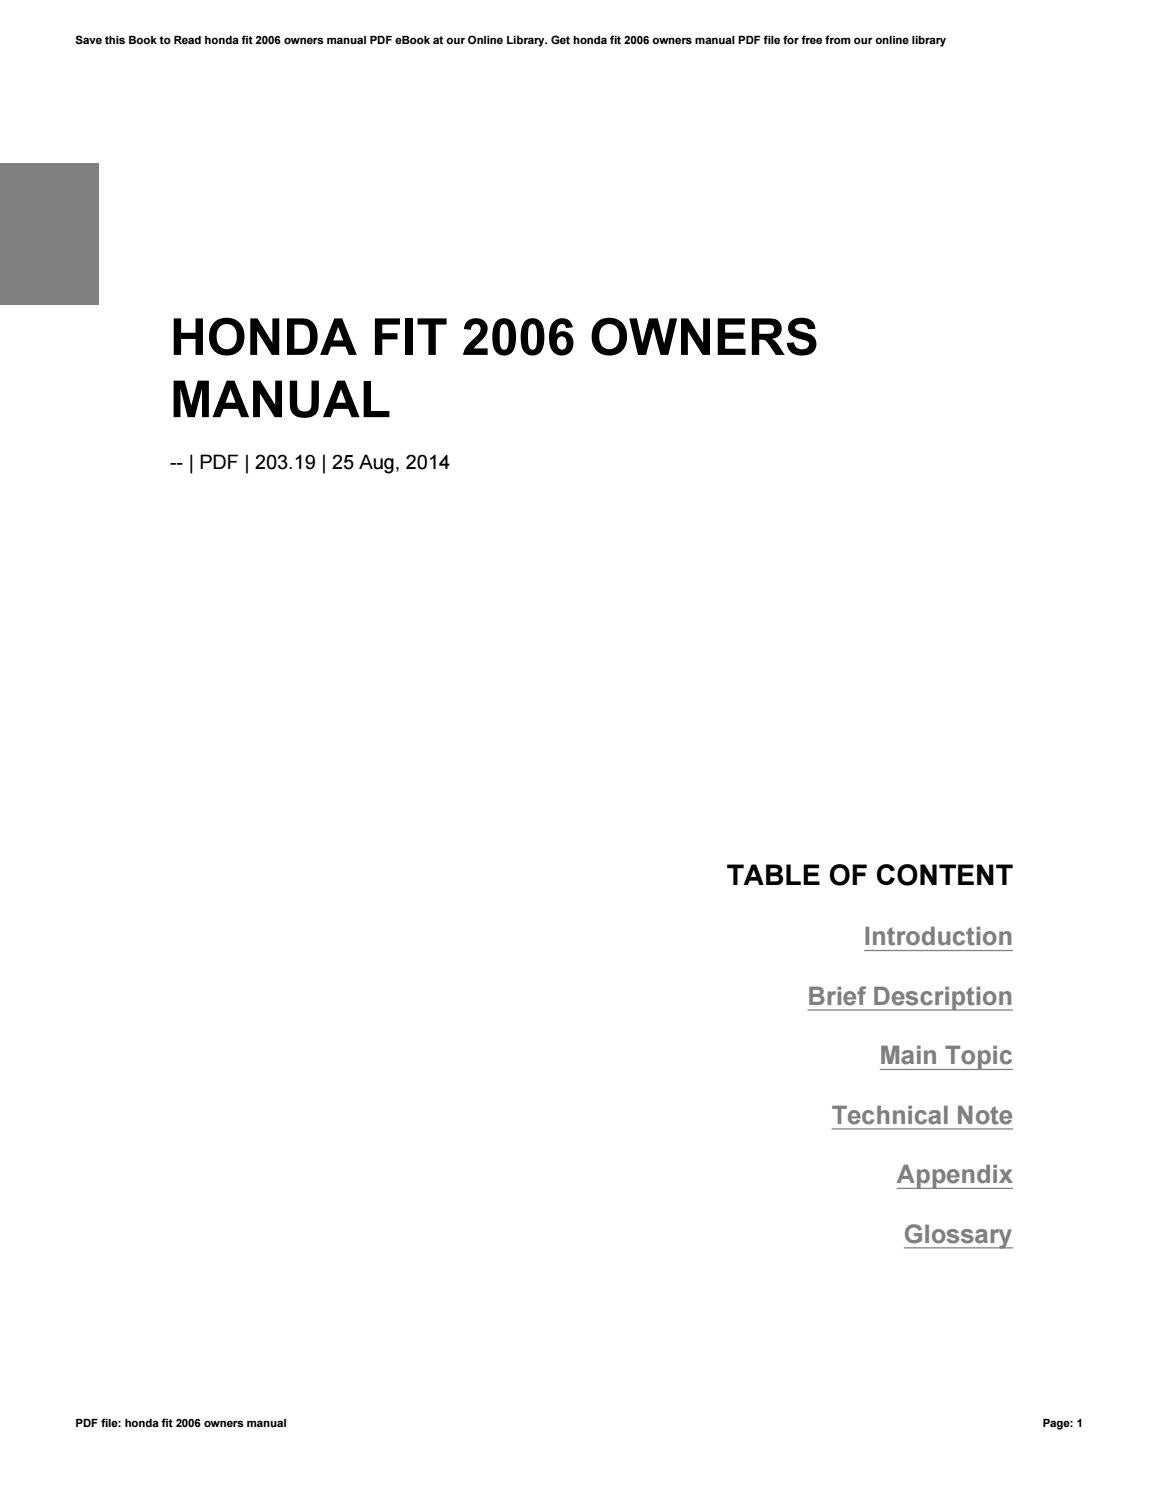 honda fit 2006 owners manual by reddit27